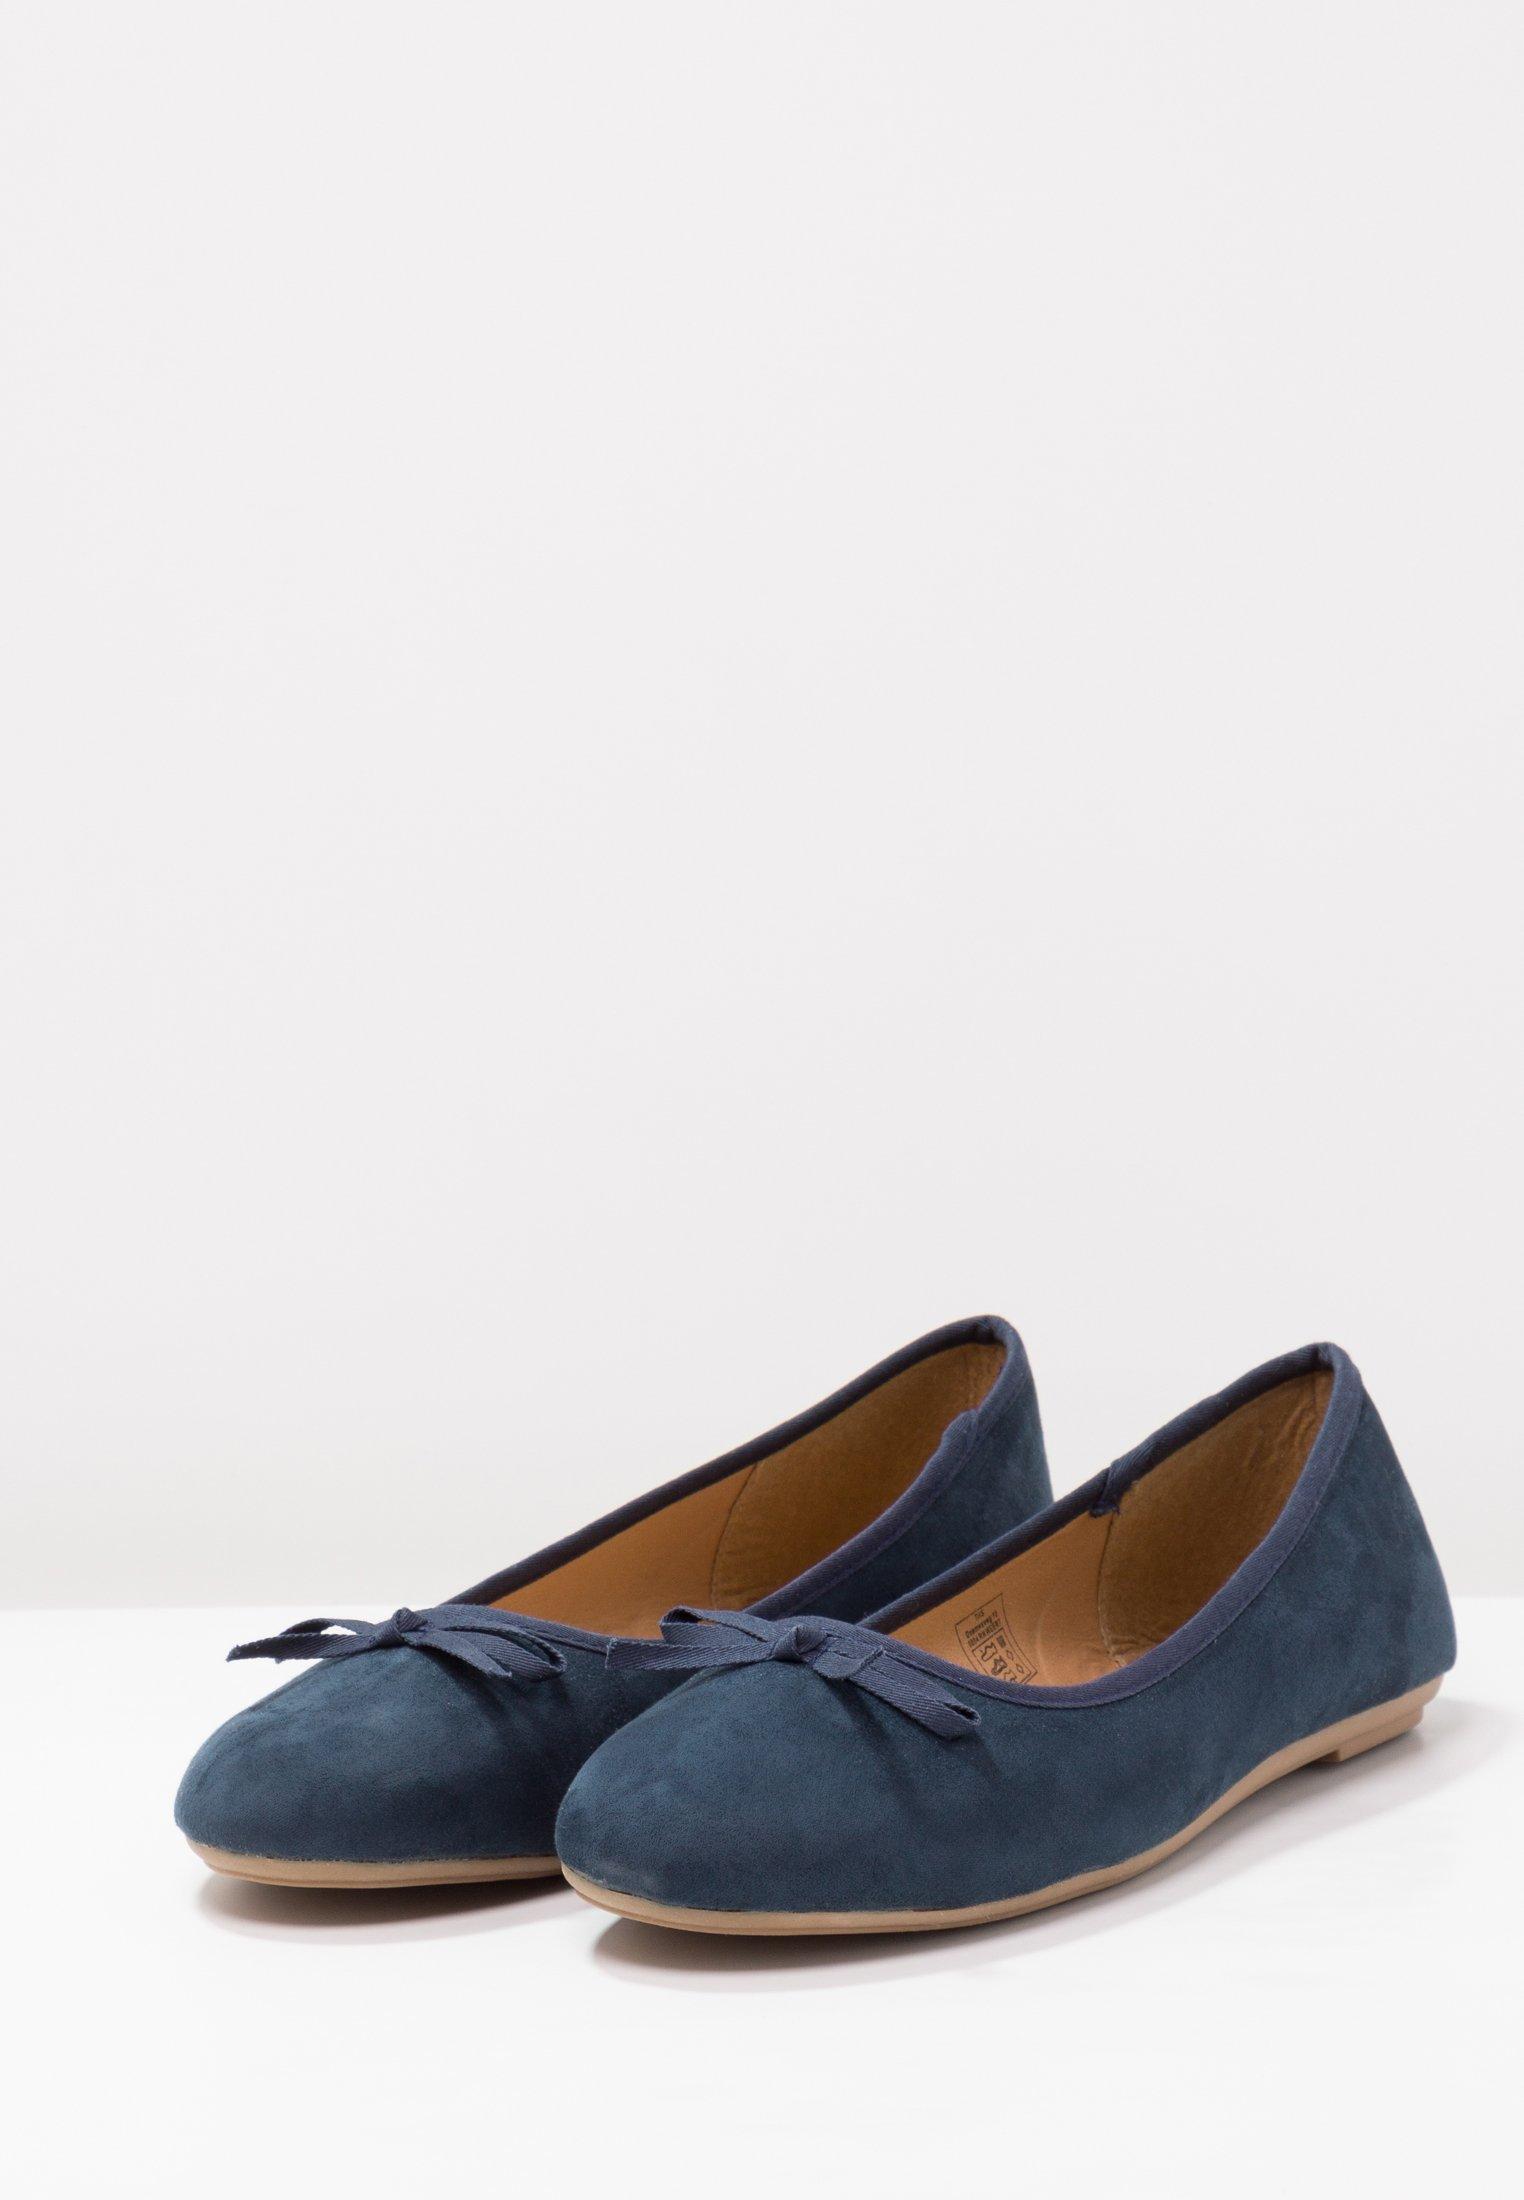 Fitters Helen - Ballerinaskor Navy